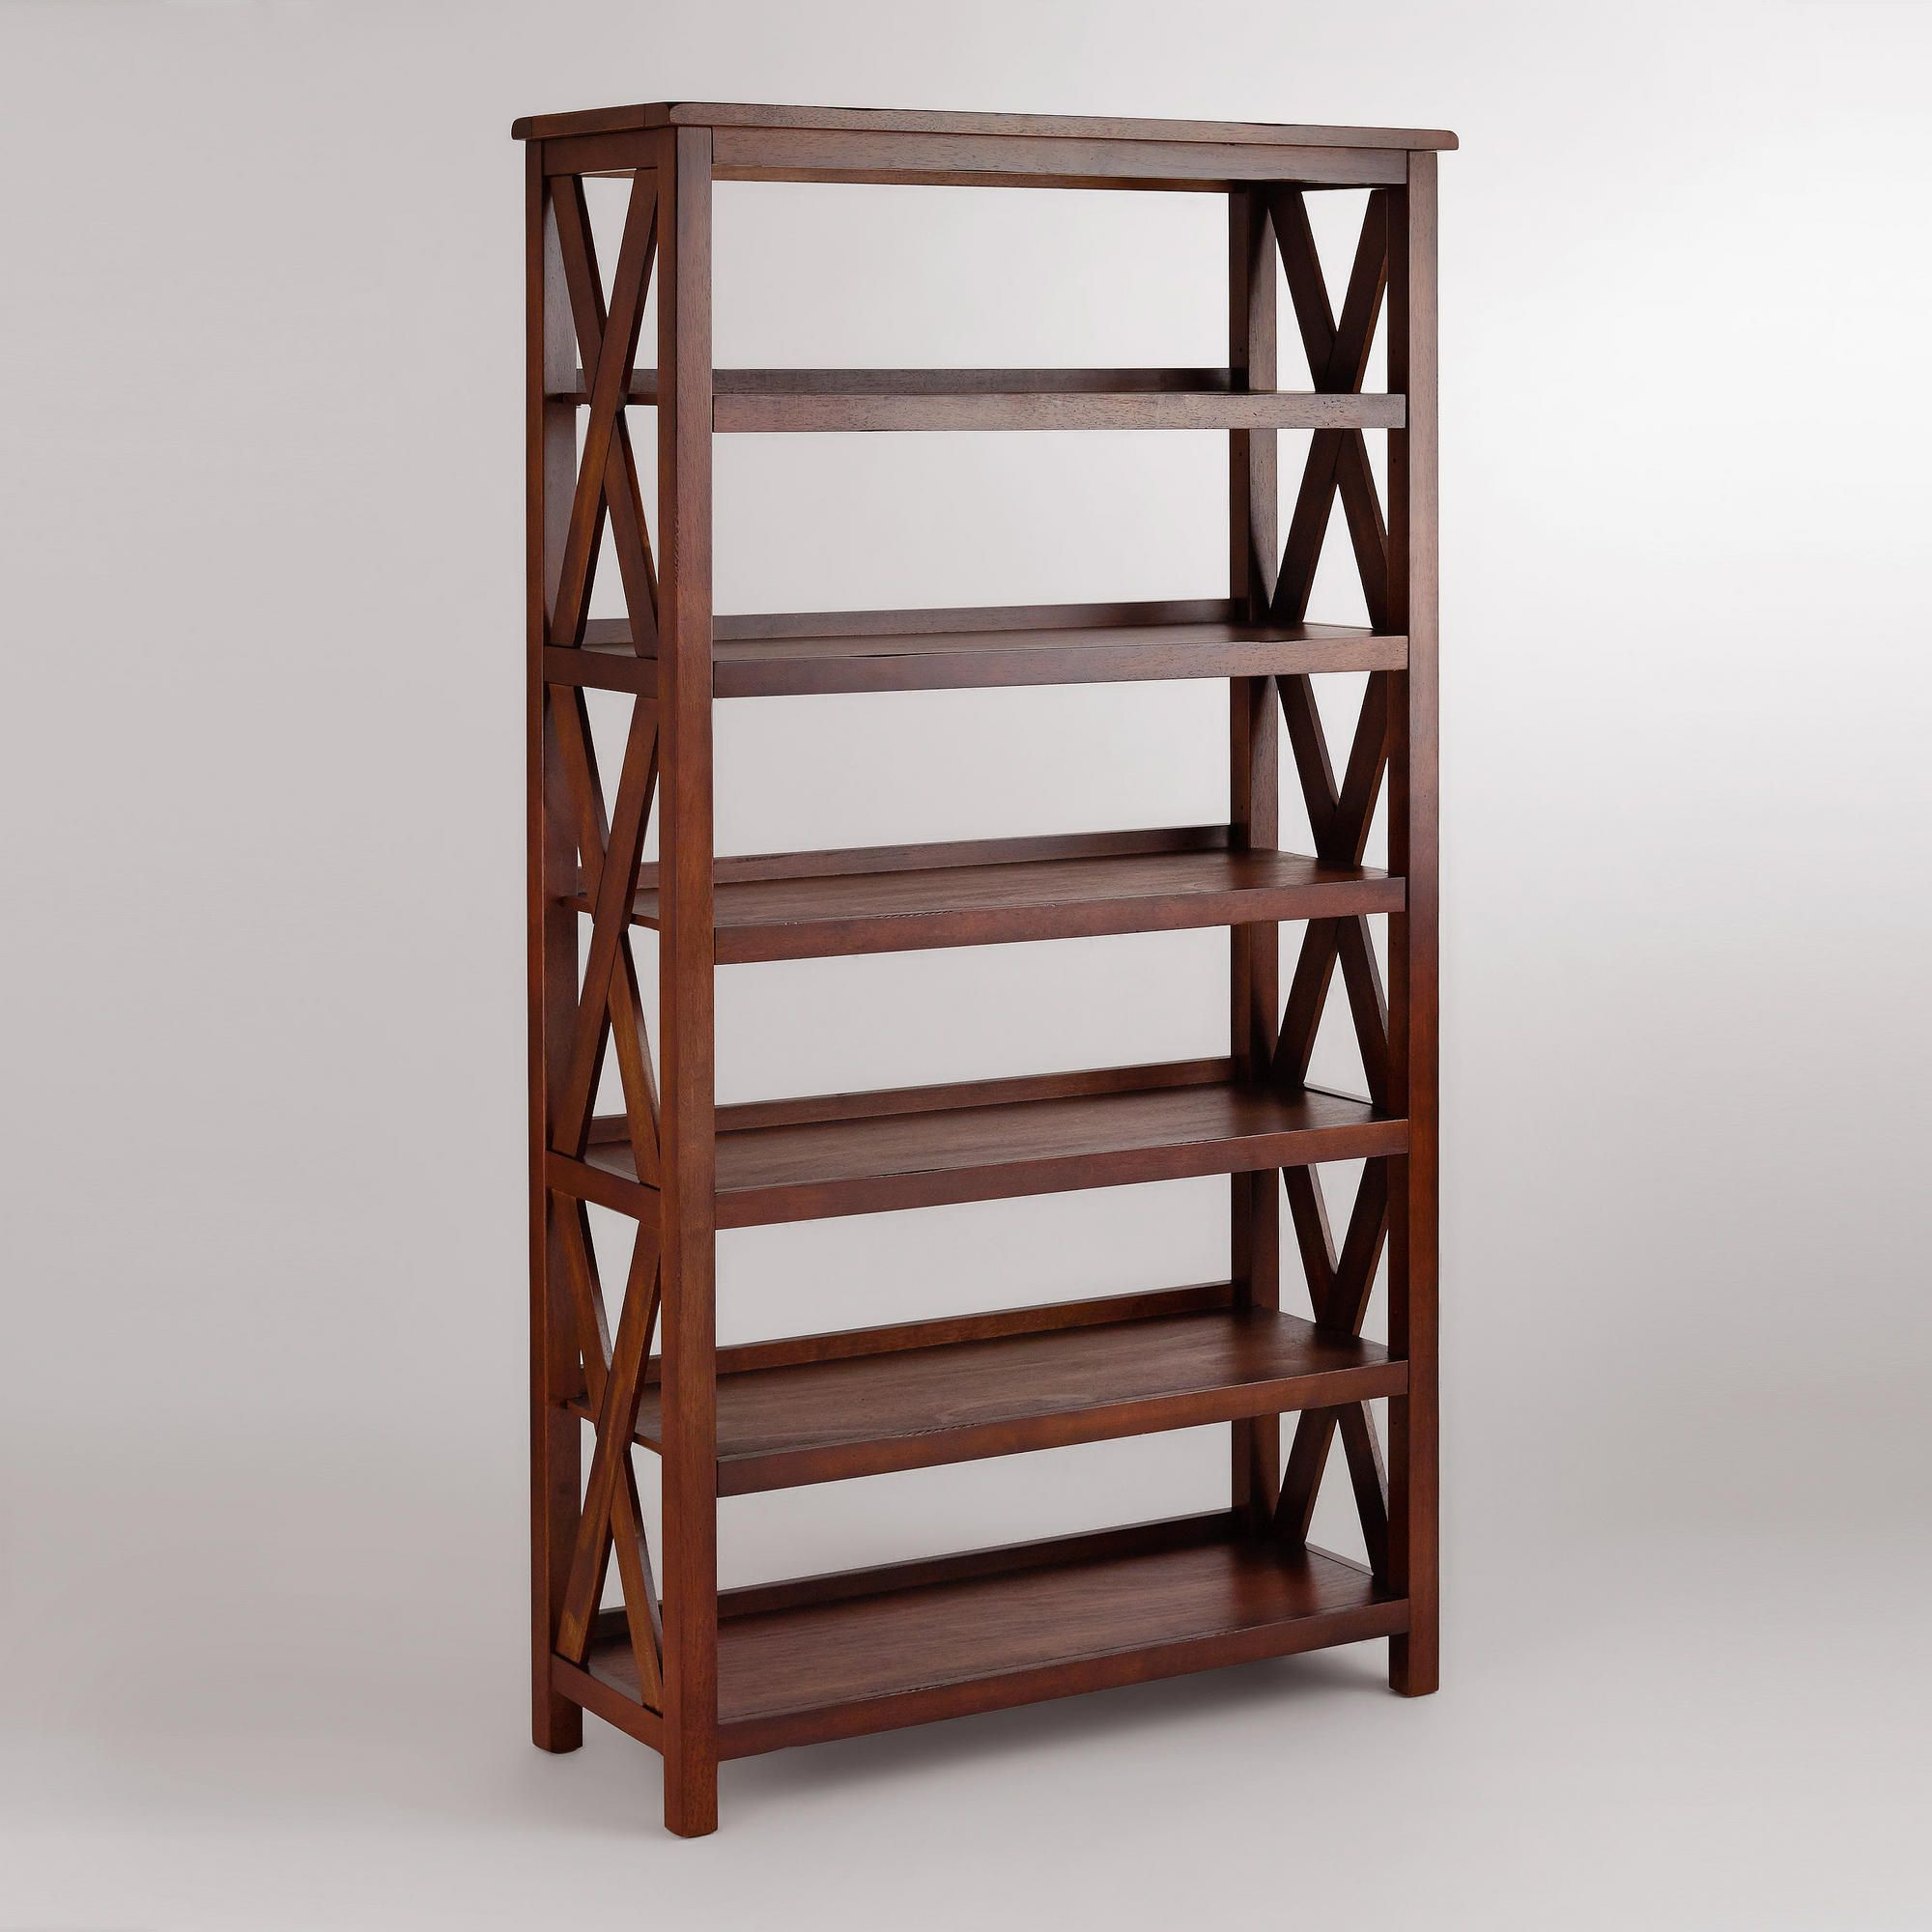 Verona Six-Shelf Bookshelf | World Market.